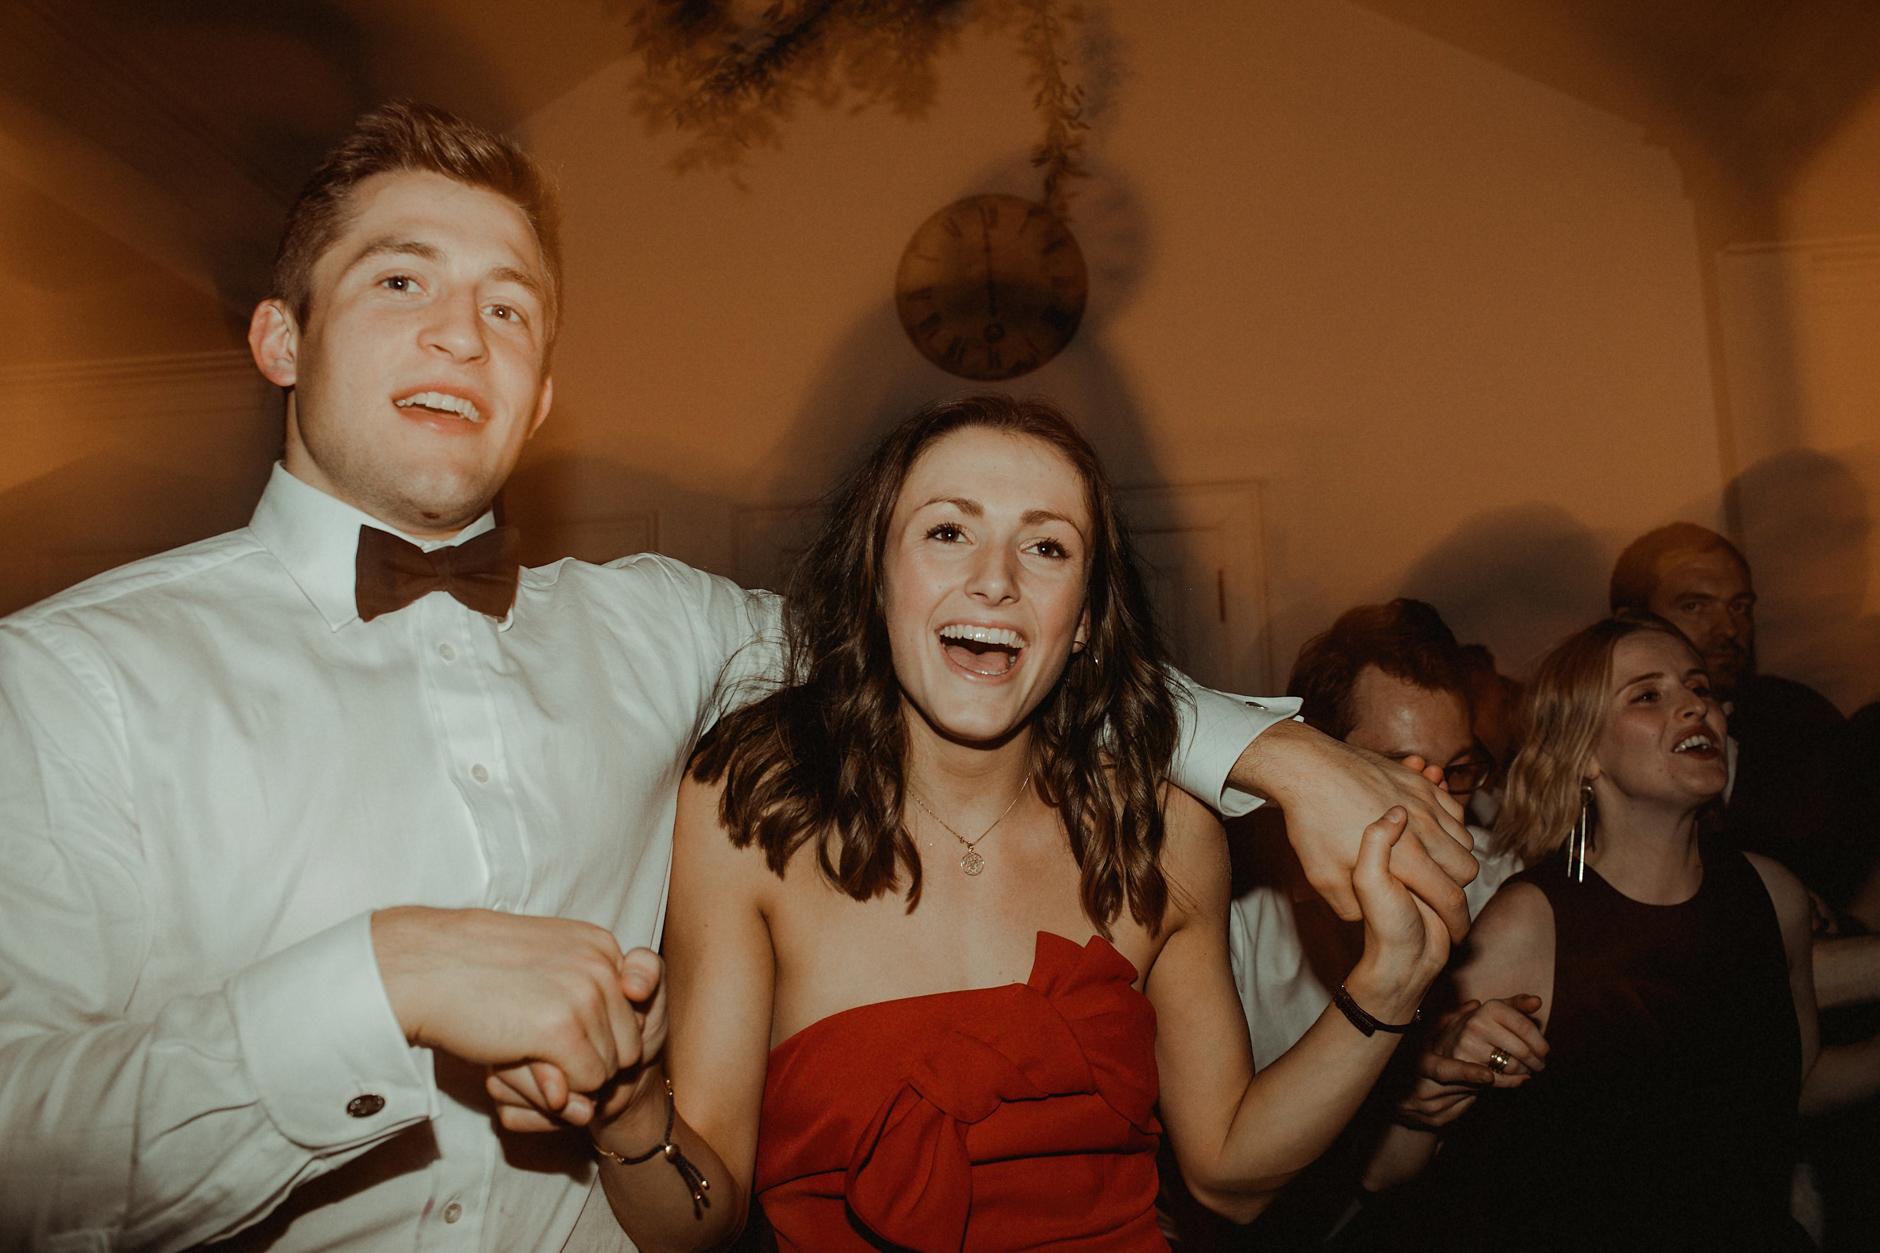 Glentruim-Wedding-Nikki-Leadbetter-Photography-403.jpg